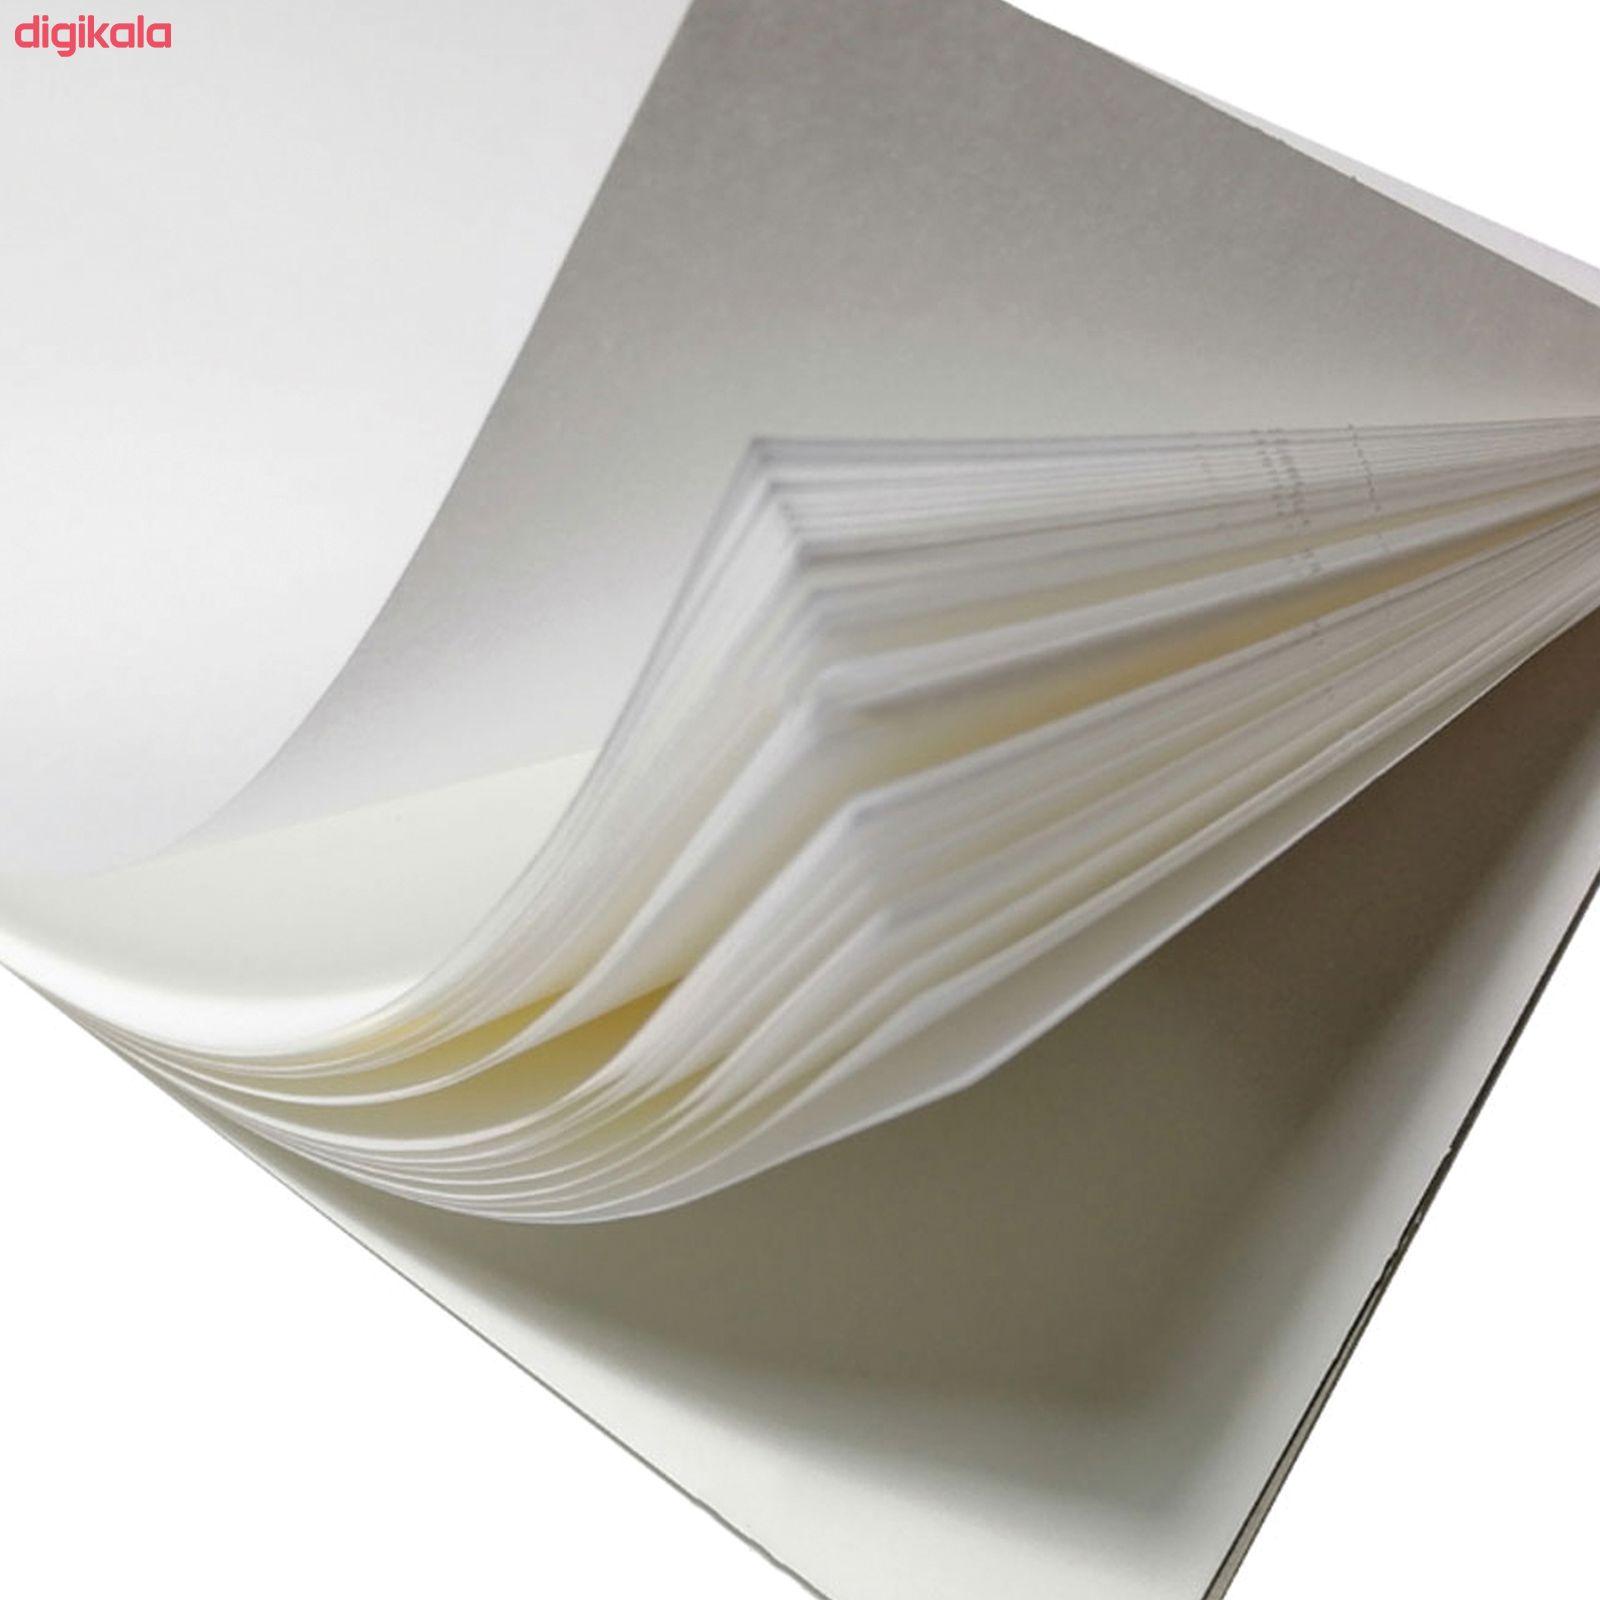 کاغذ پوستی A3 مدل cnd38 بسته 50 عددی  main 1 3